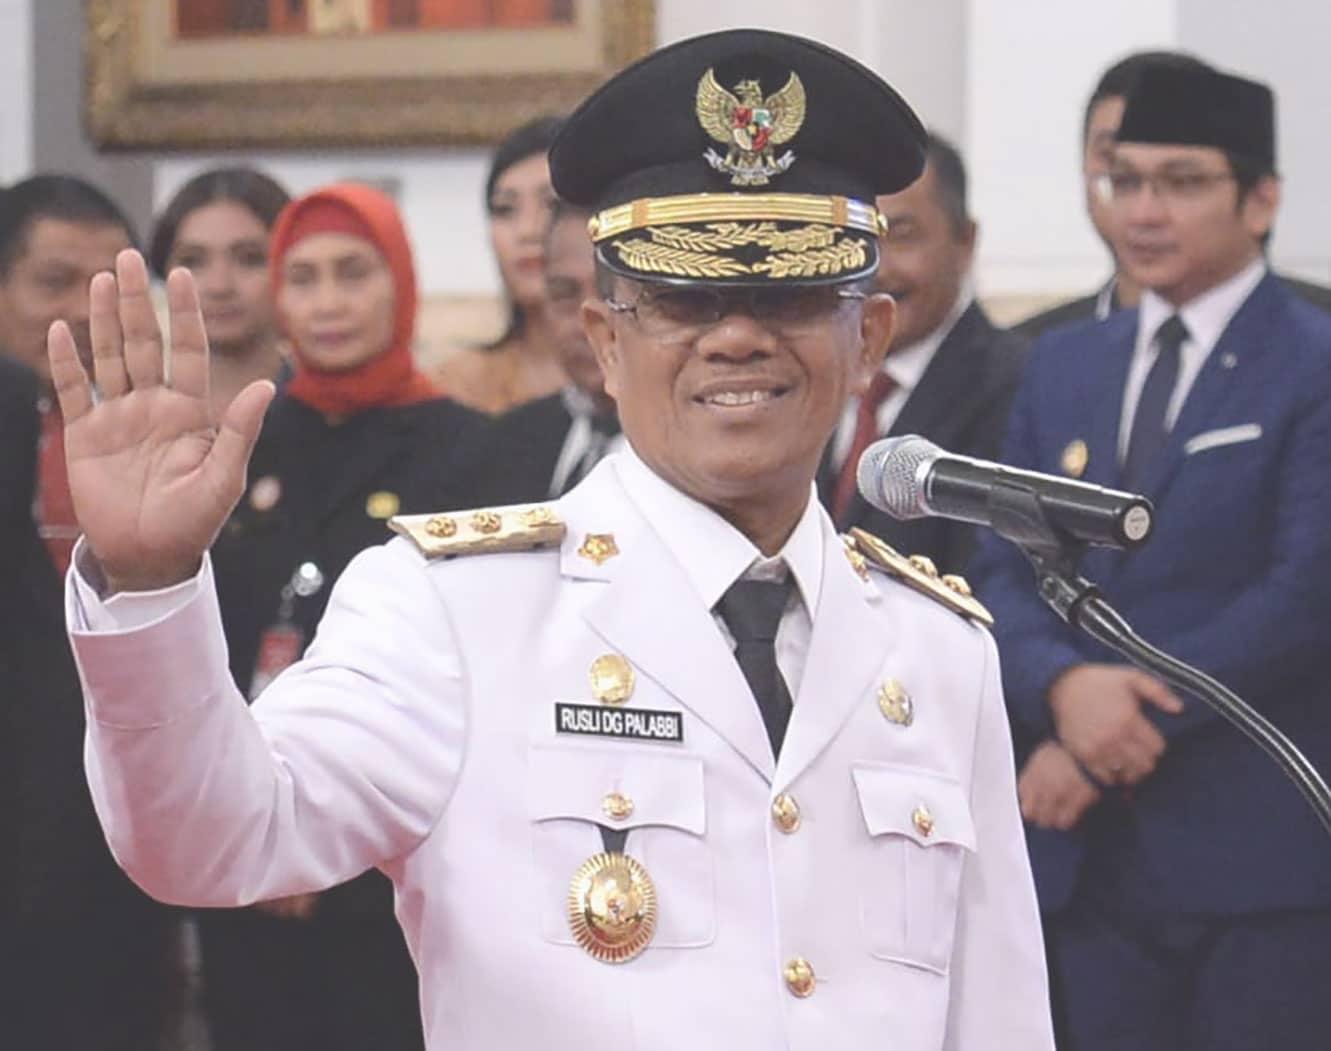 Wagub Sulawesi Tengah Klaim Mandat PAN